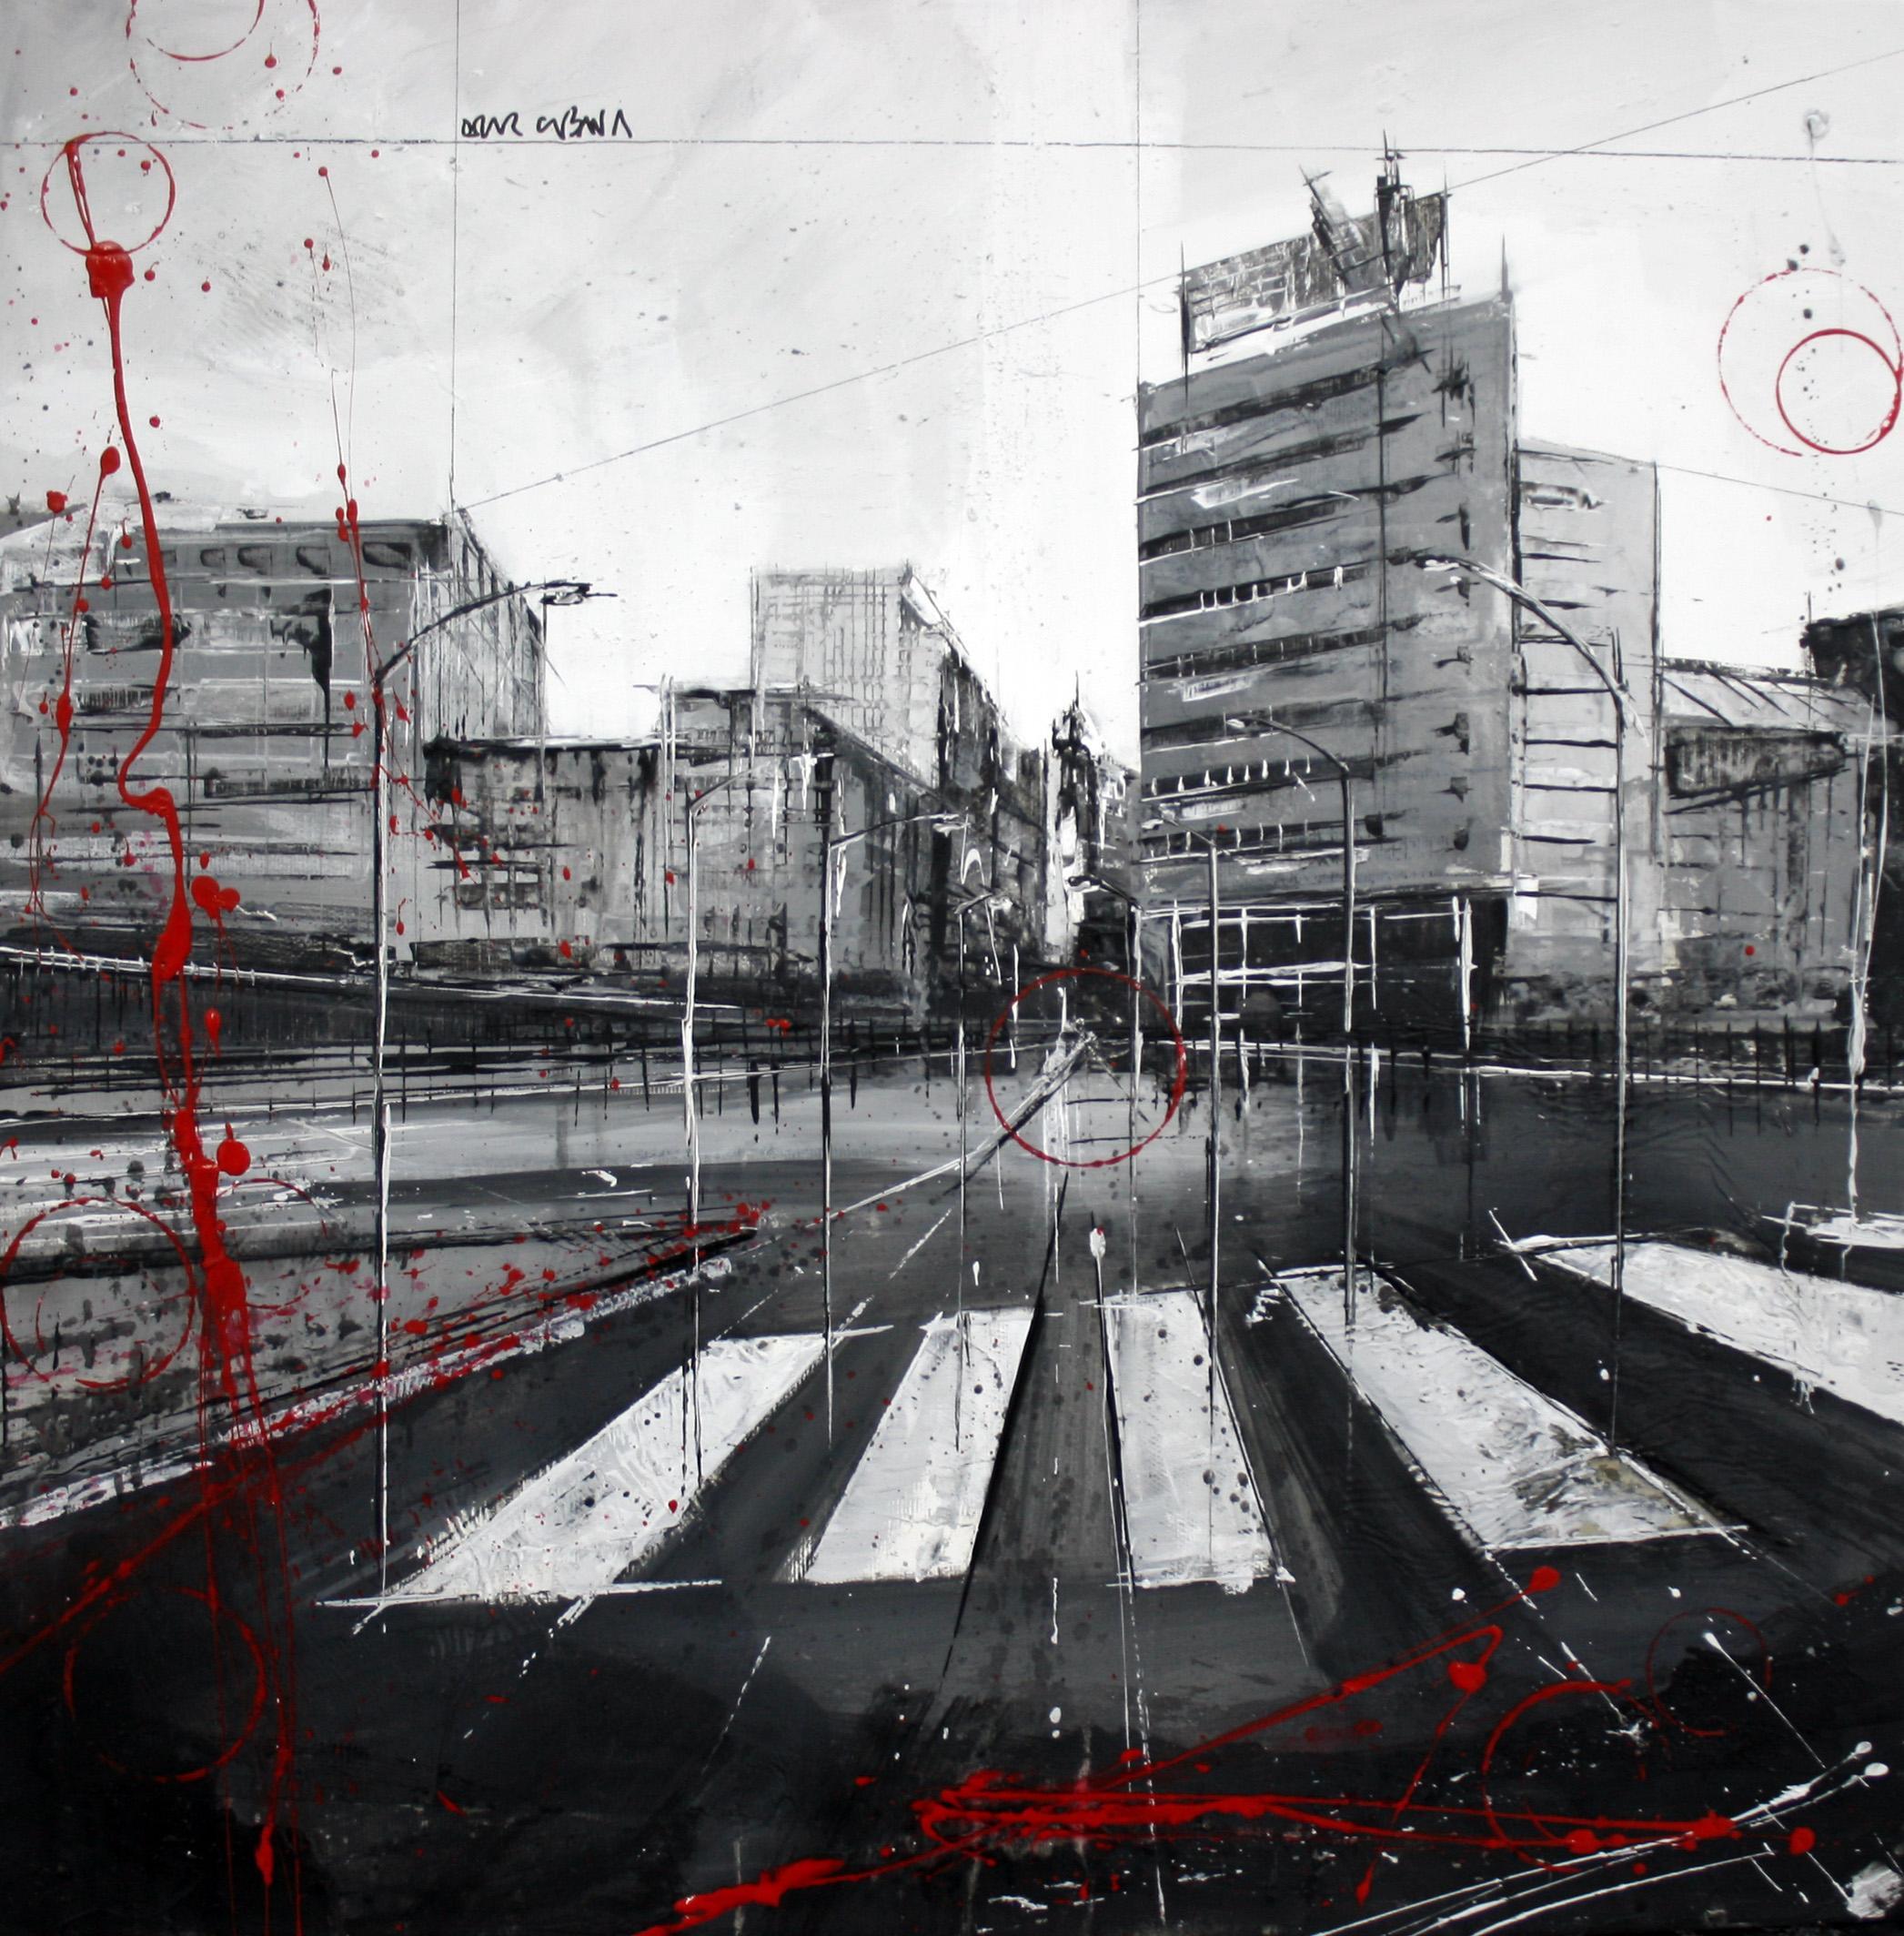 825_calle juan florez – calle falperra_50x50cm_mixta sobre lienzo